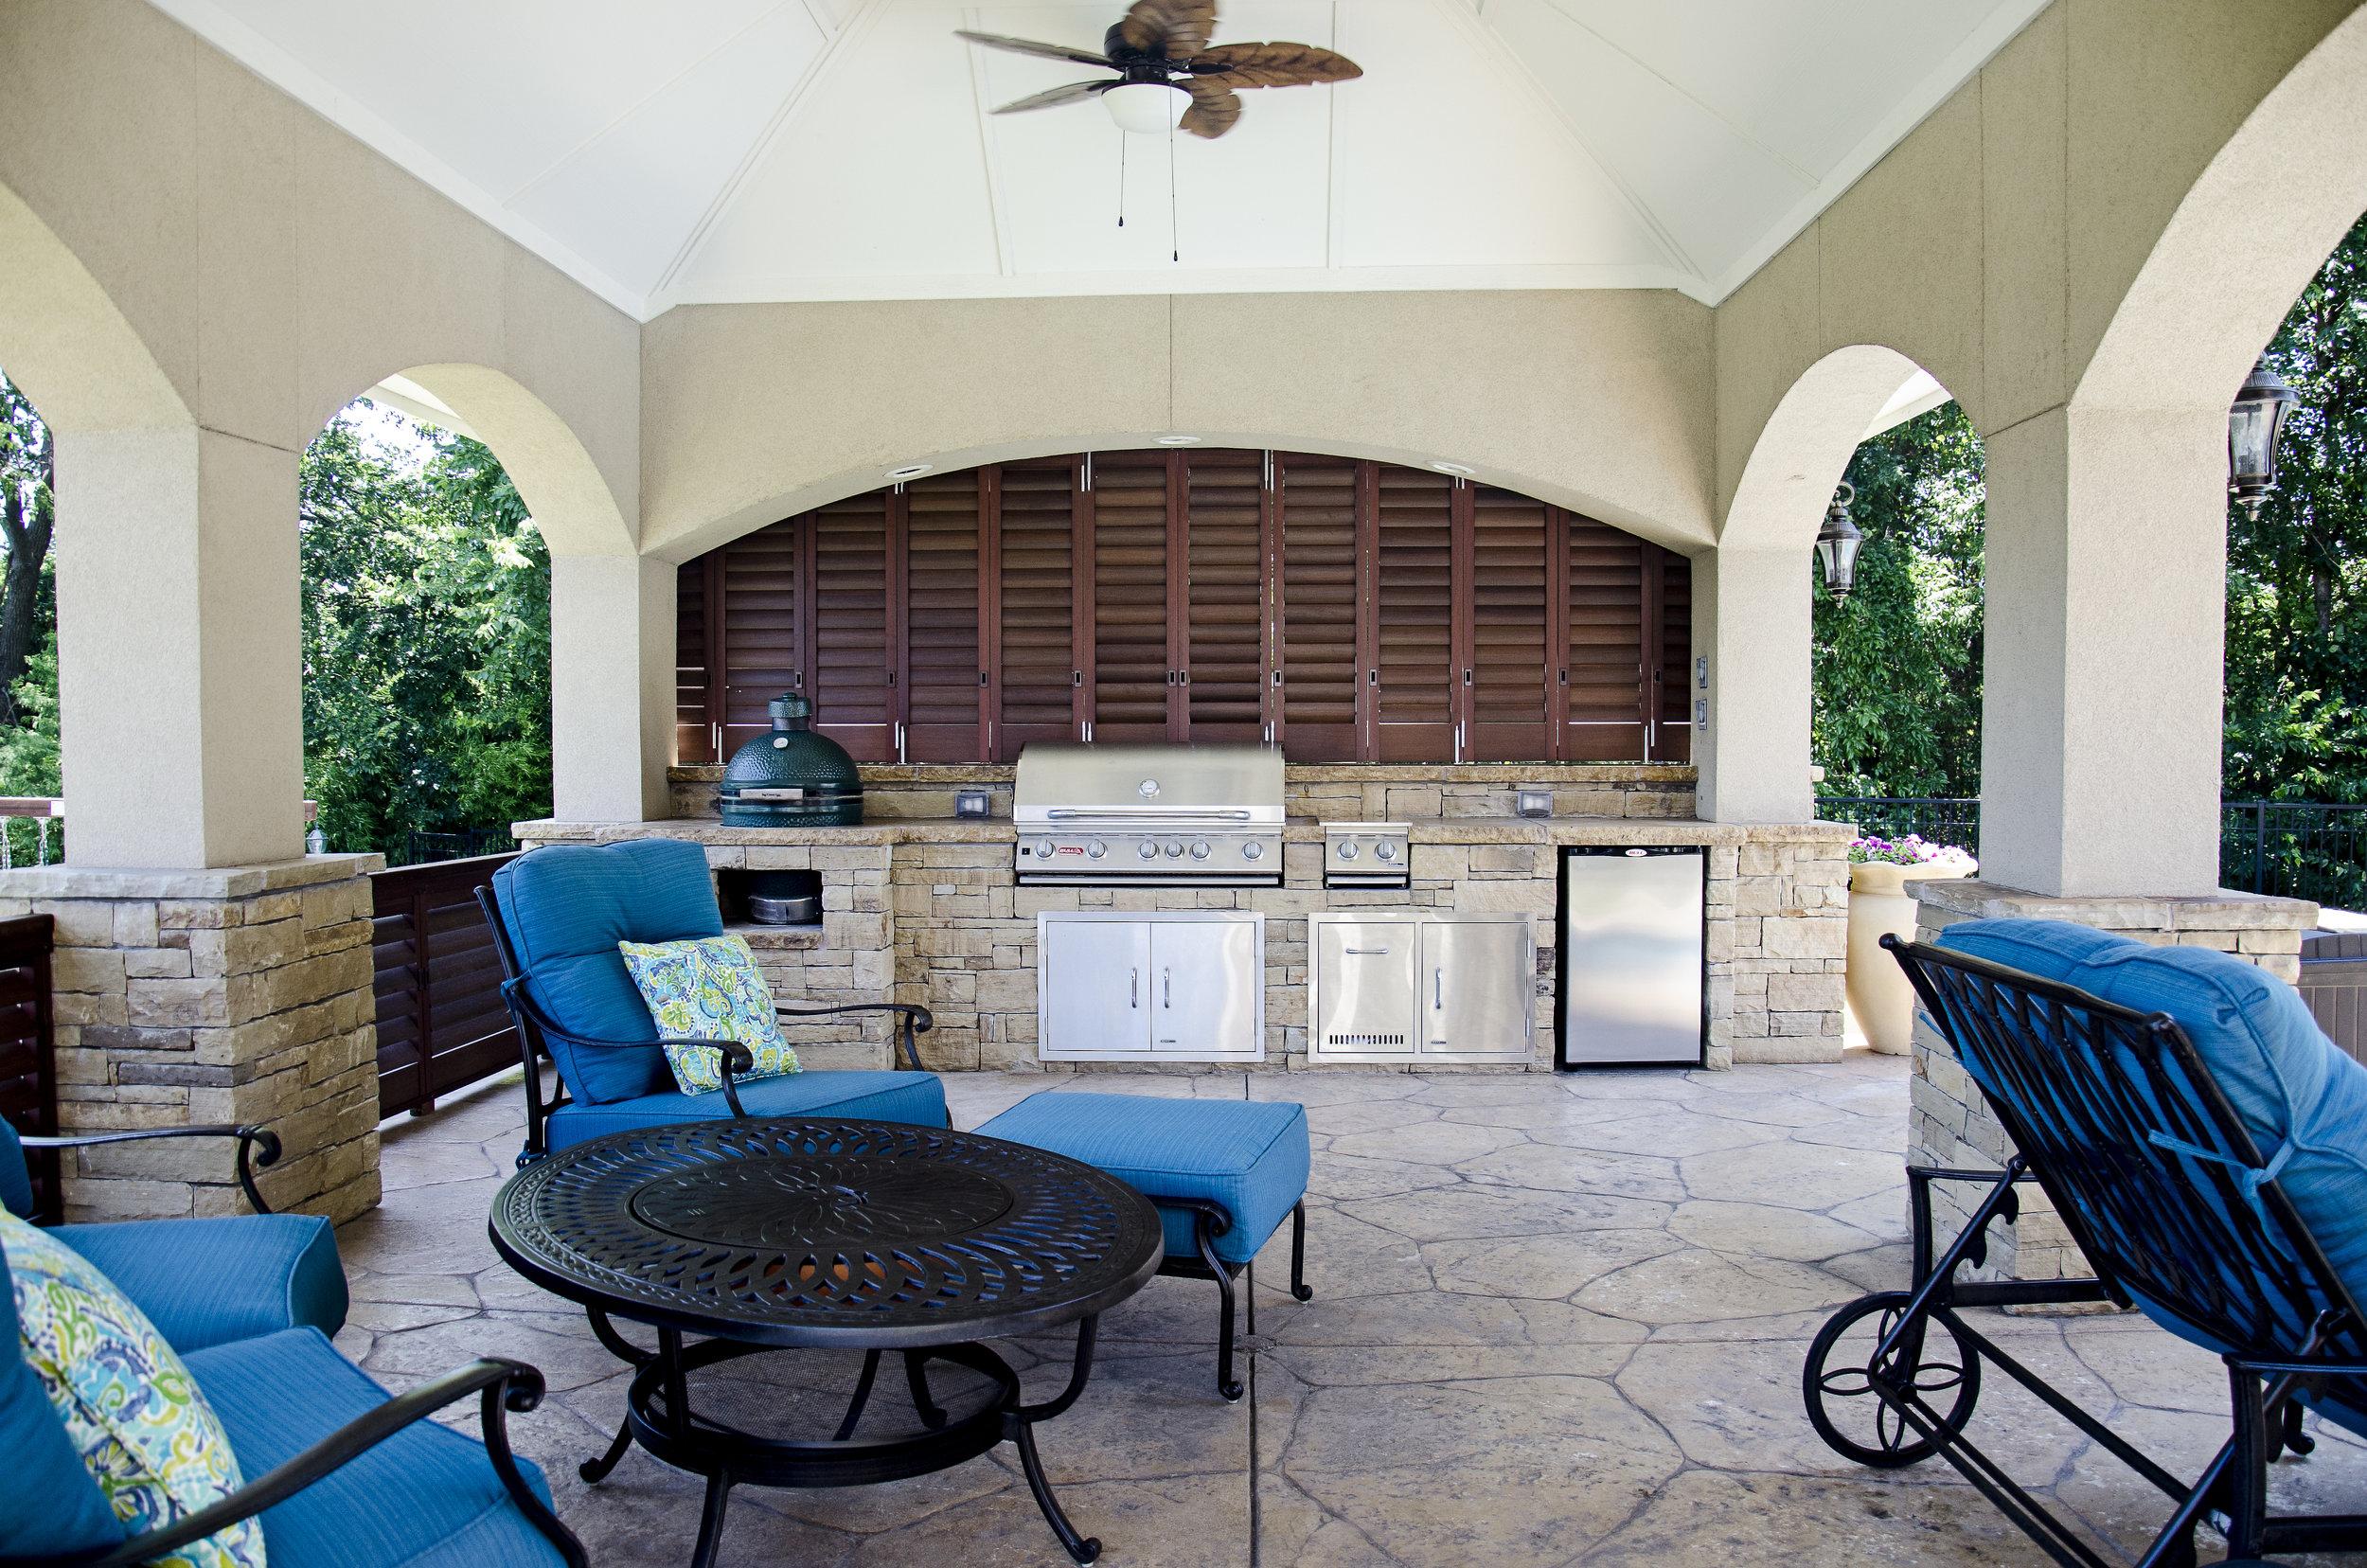 Walnut Aluminum Shutters - Outdoor Kitchen.jpg